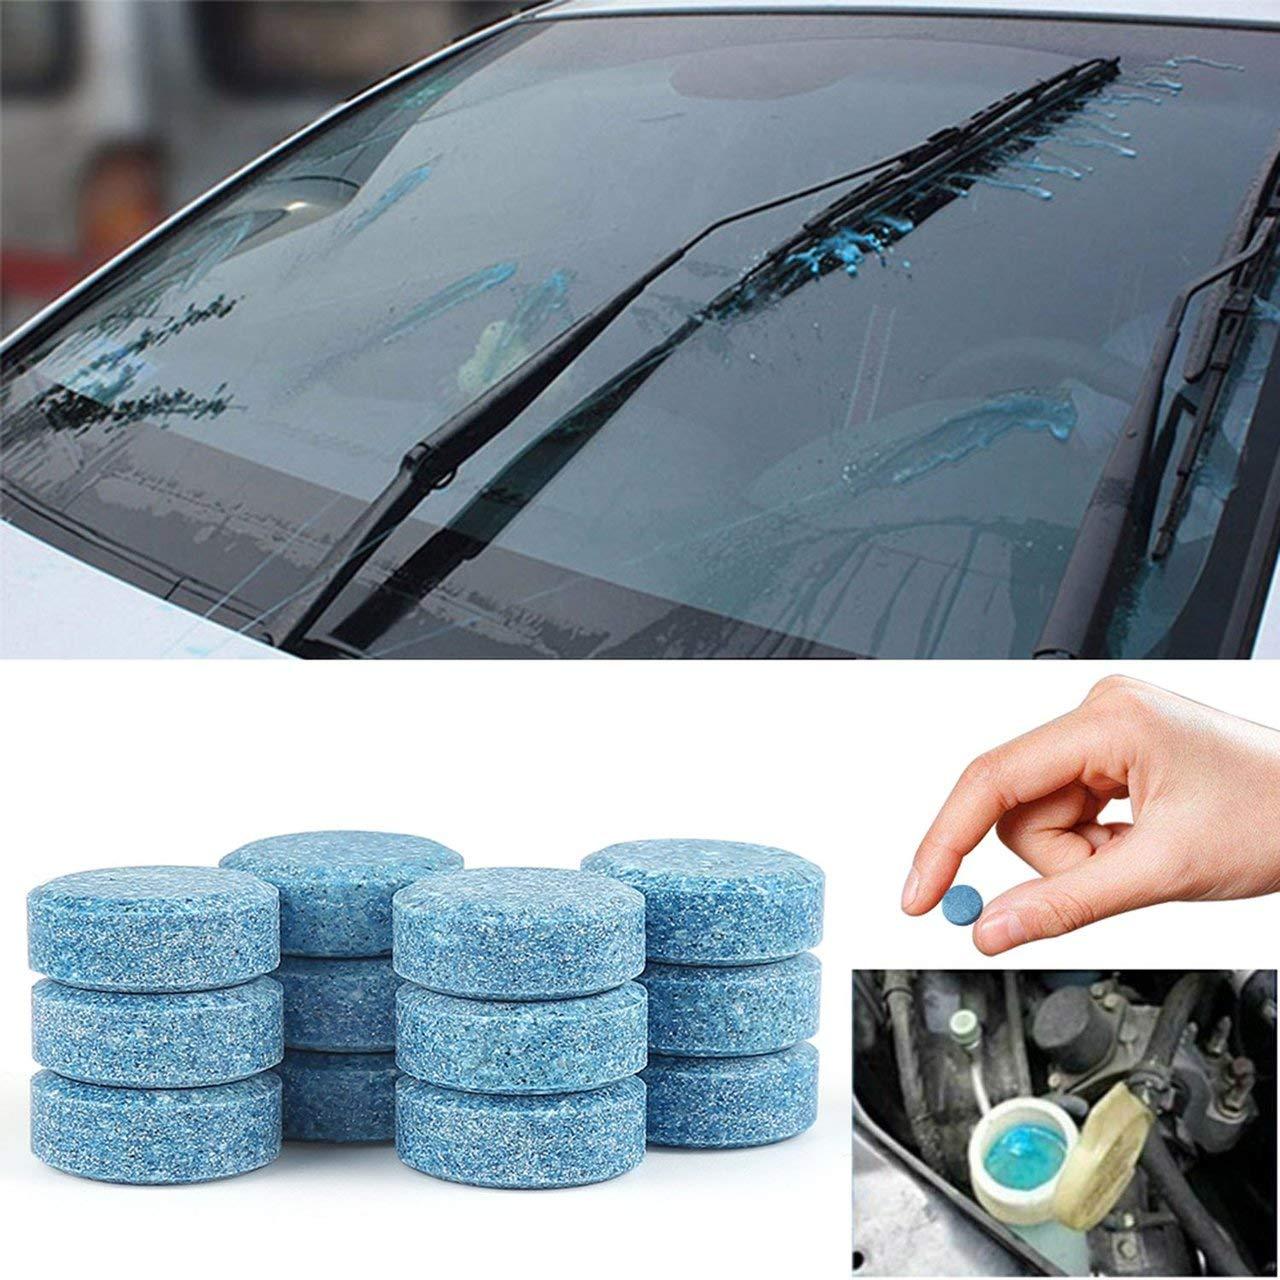 10Pcs Effervescent Car Cleaner Tablets